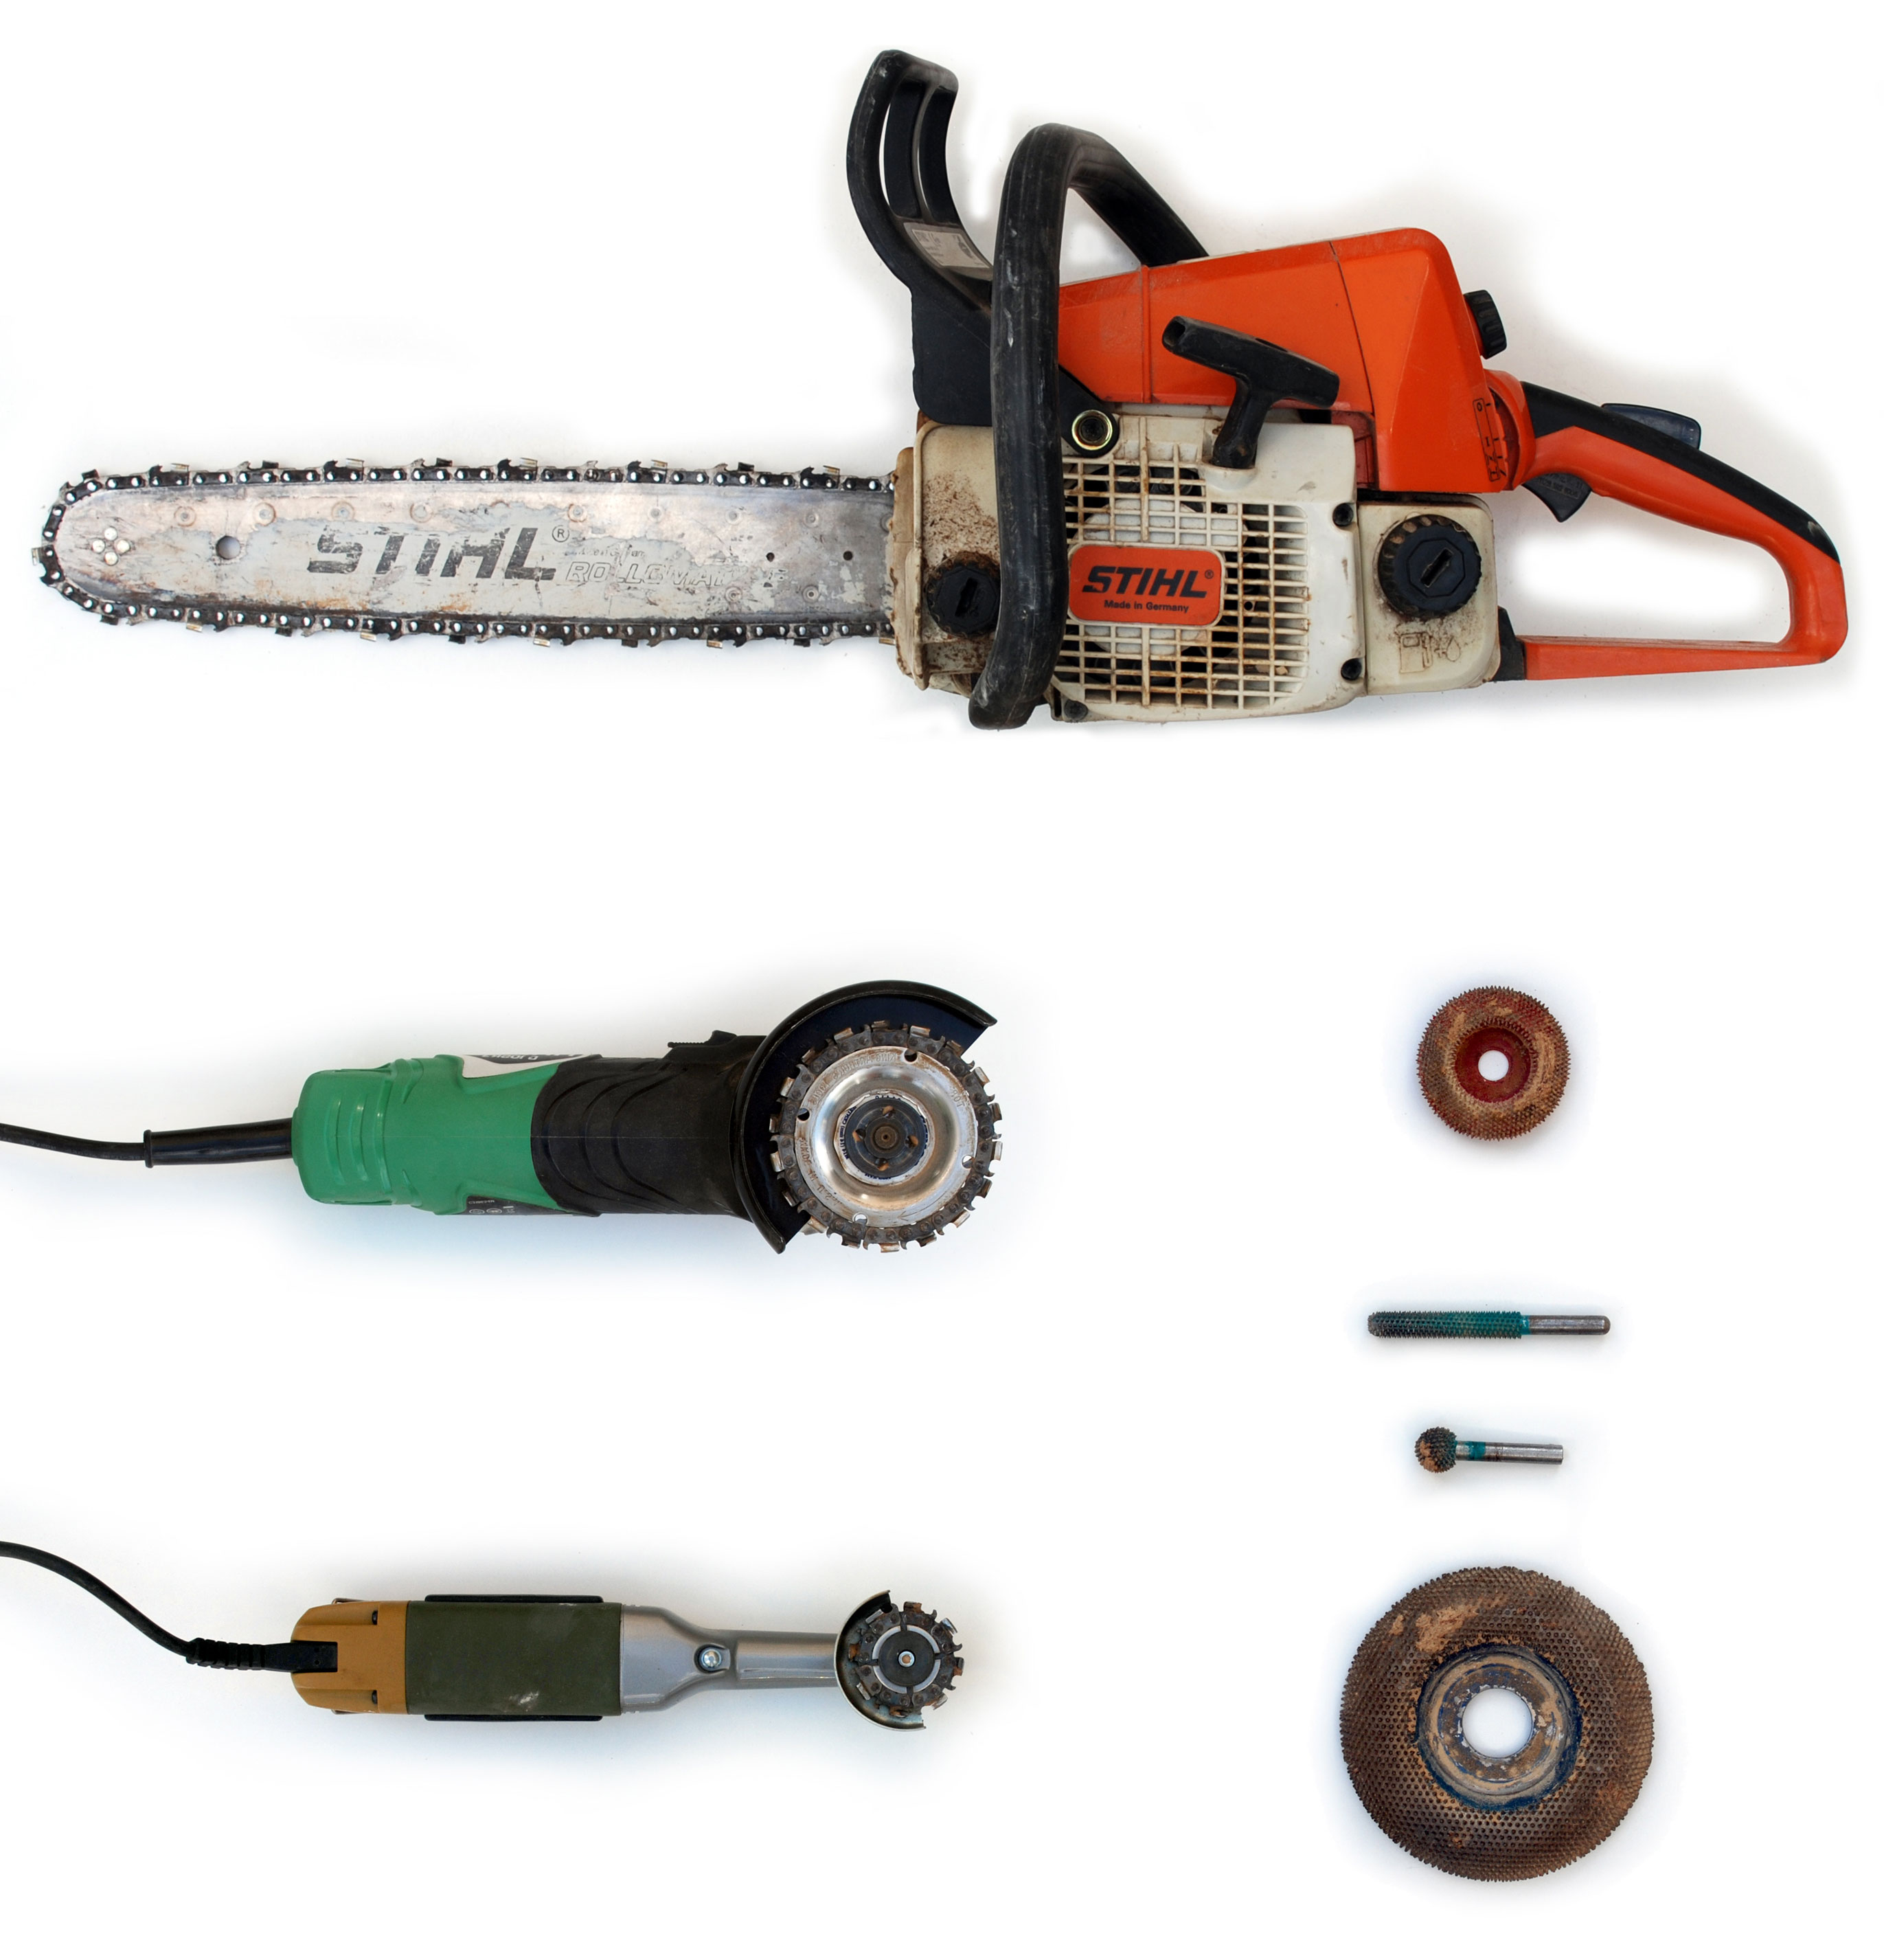 Power tools used